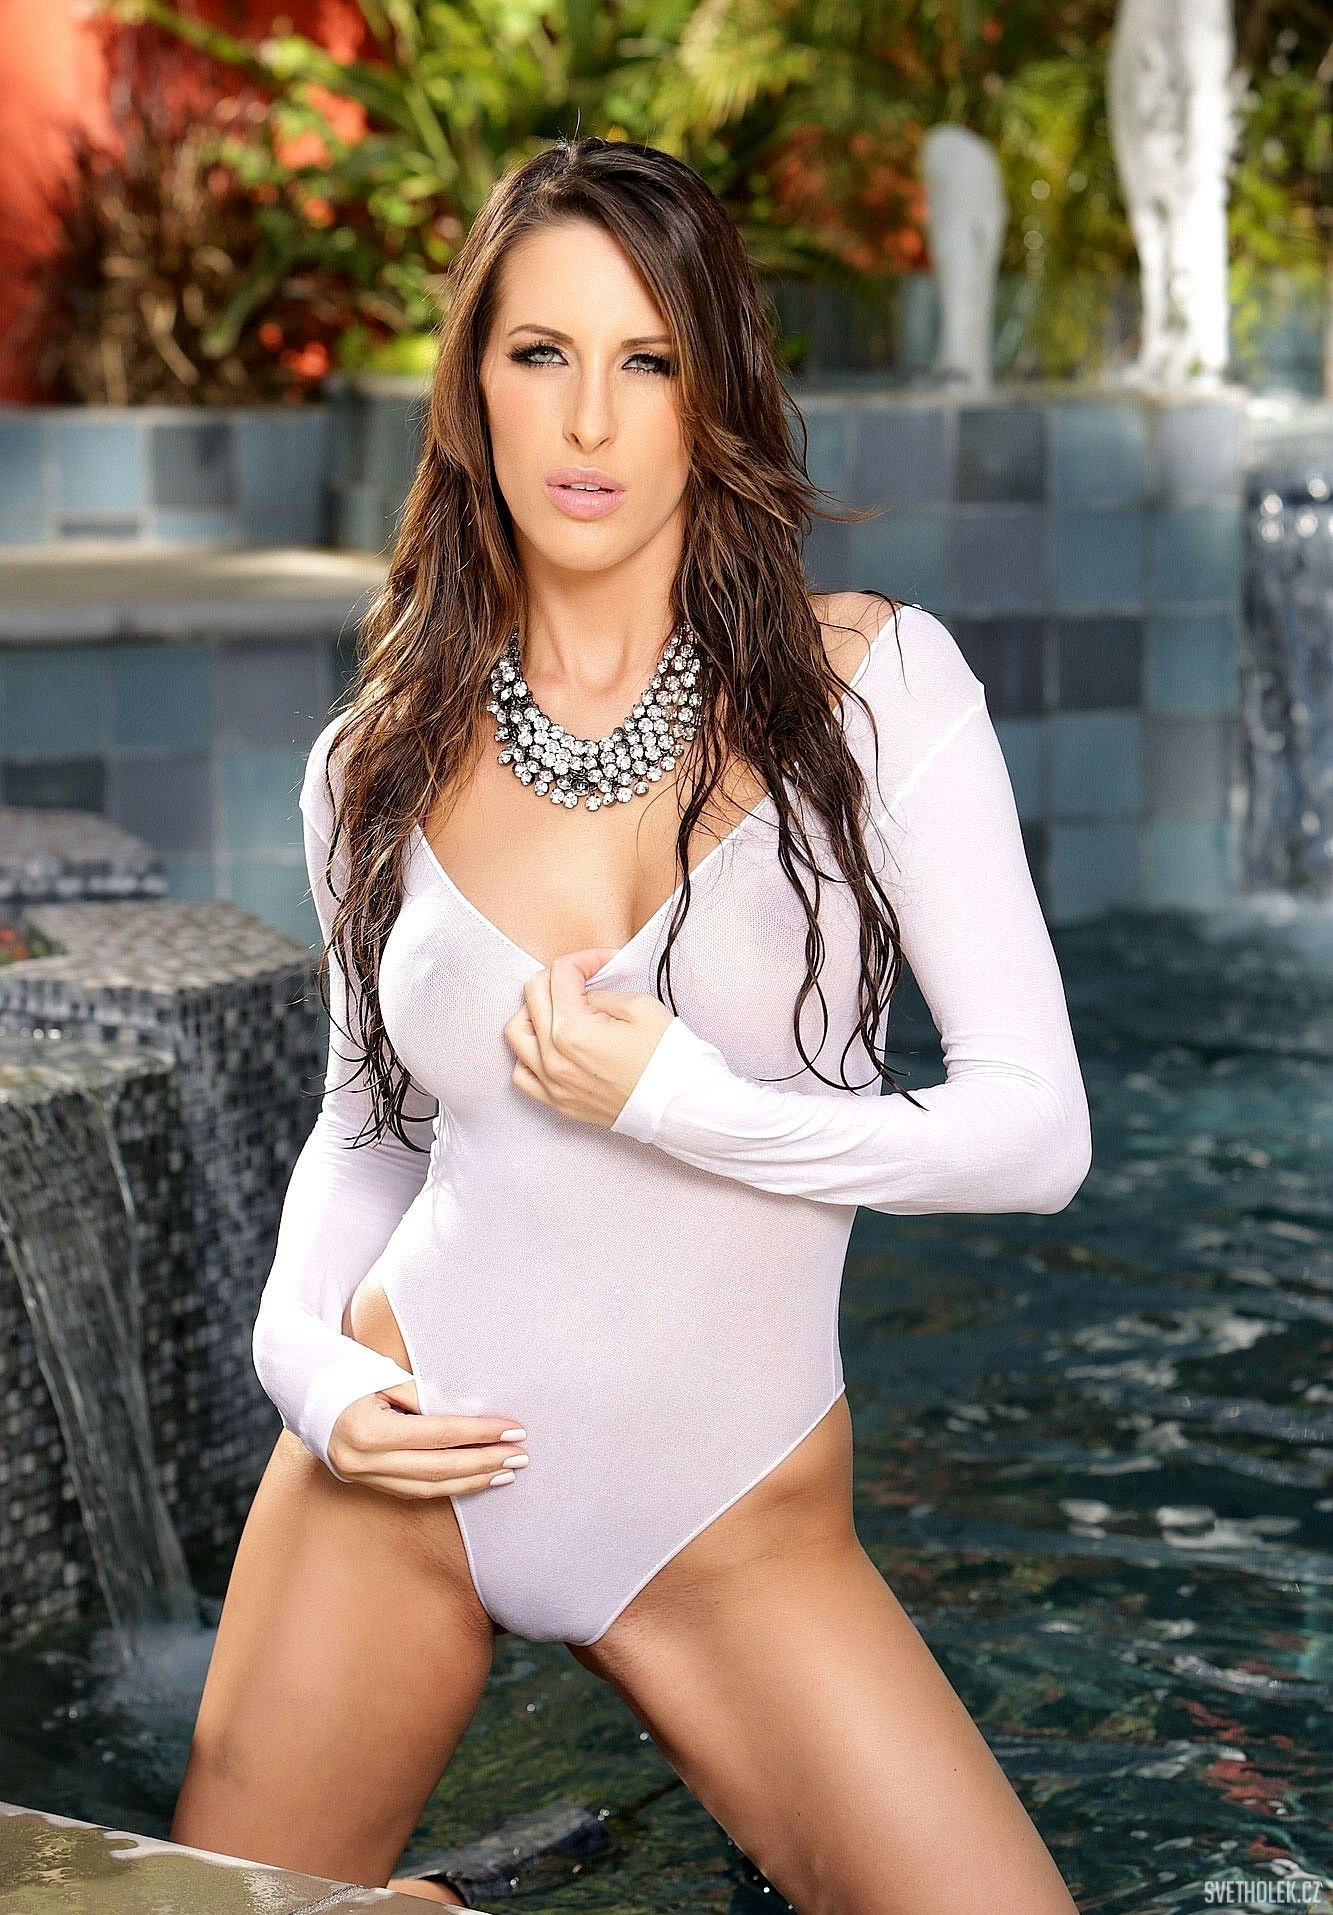 Kortney Kane Wet 45 Bra Cup Sizes Model Hot Beautiful